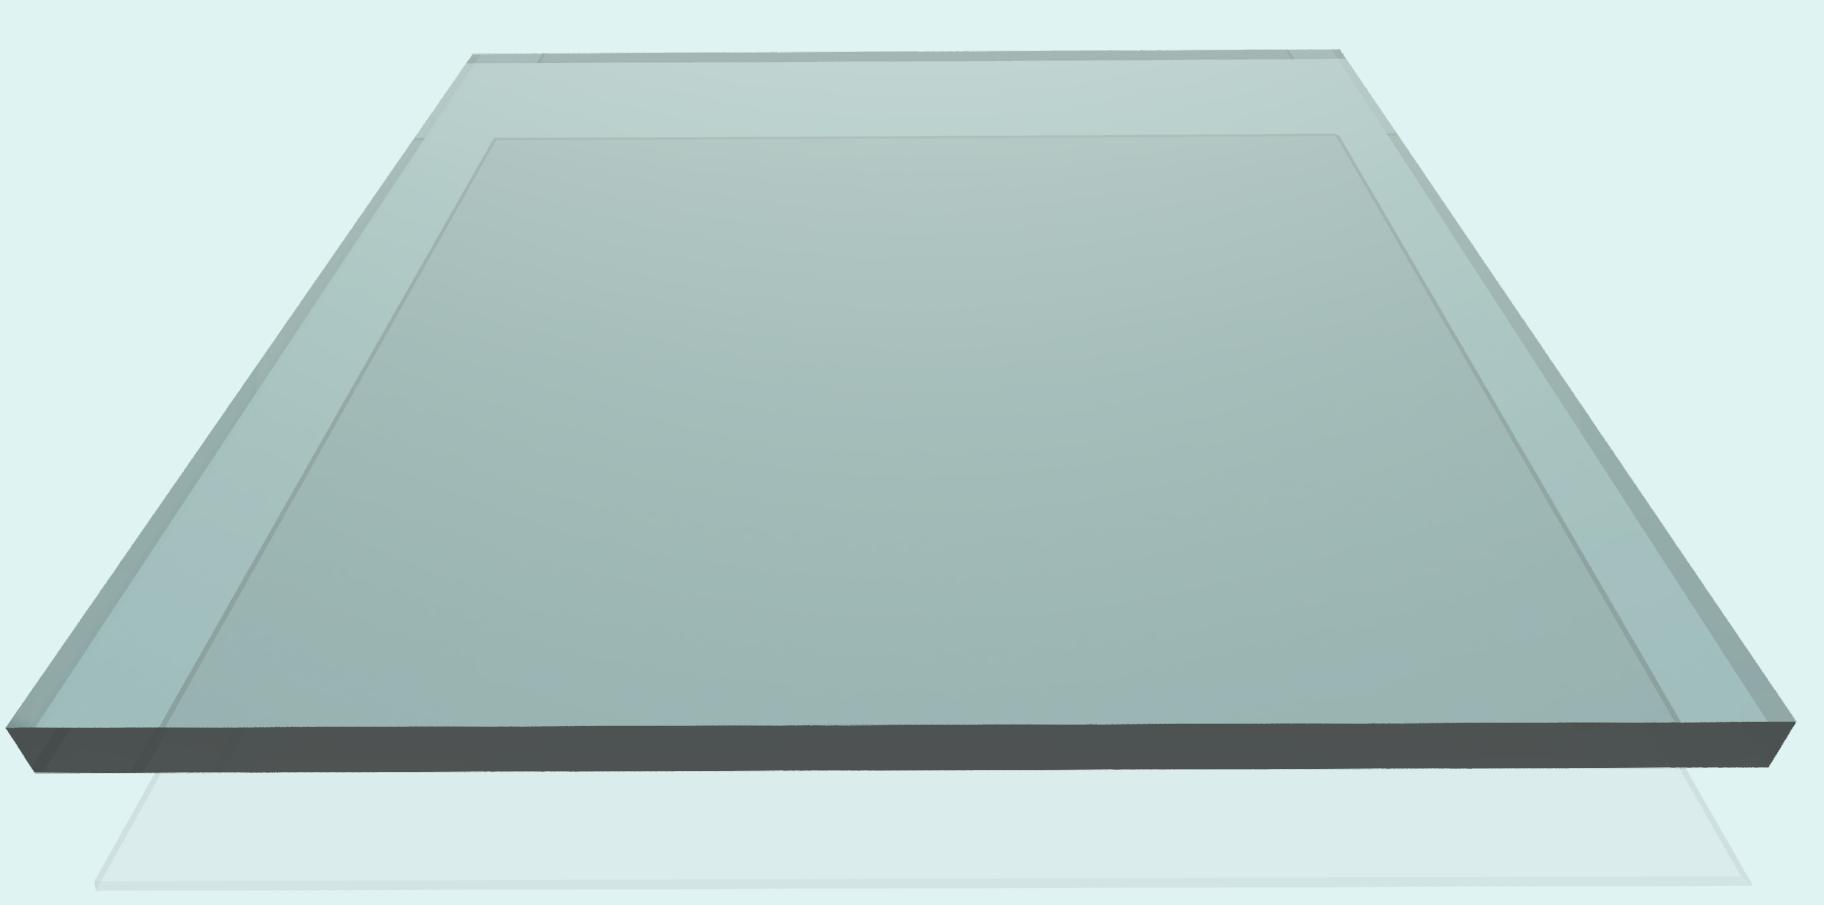 Polycarbonat 8 mm, klar